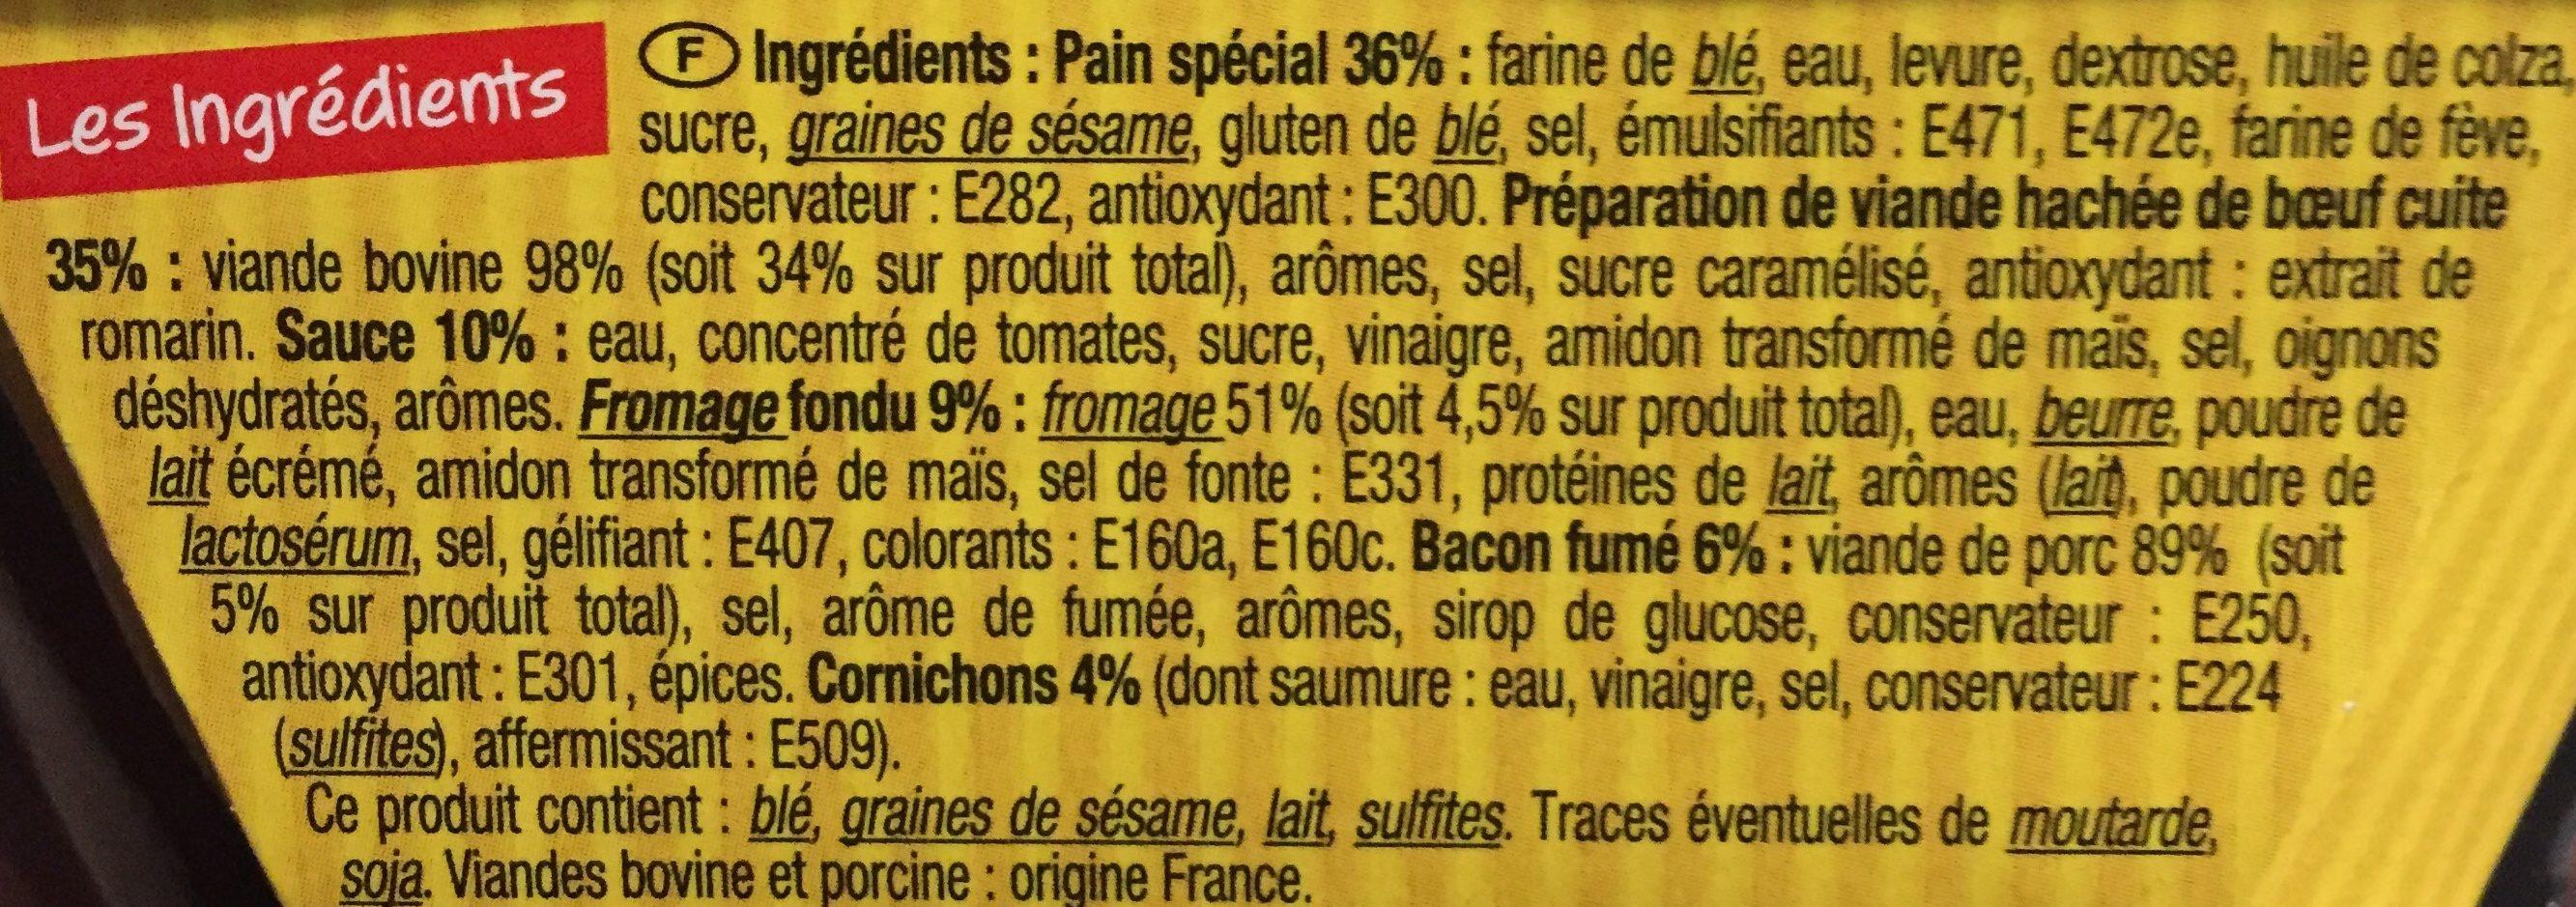 2 Bacons Burger - Ingrédients - fr